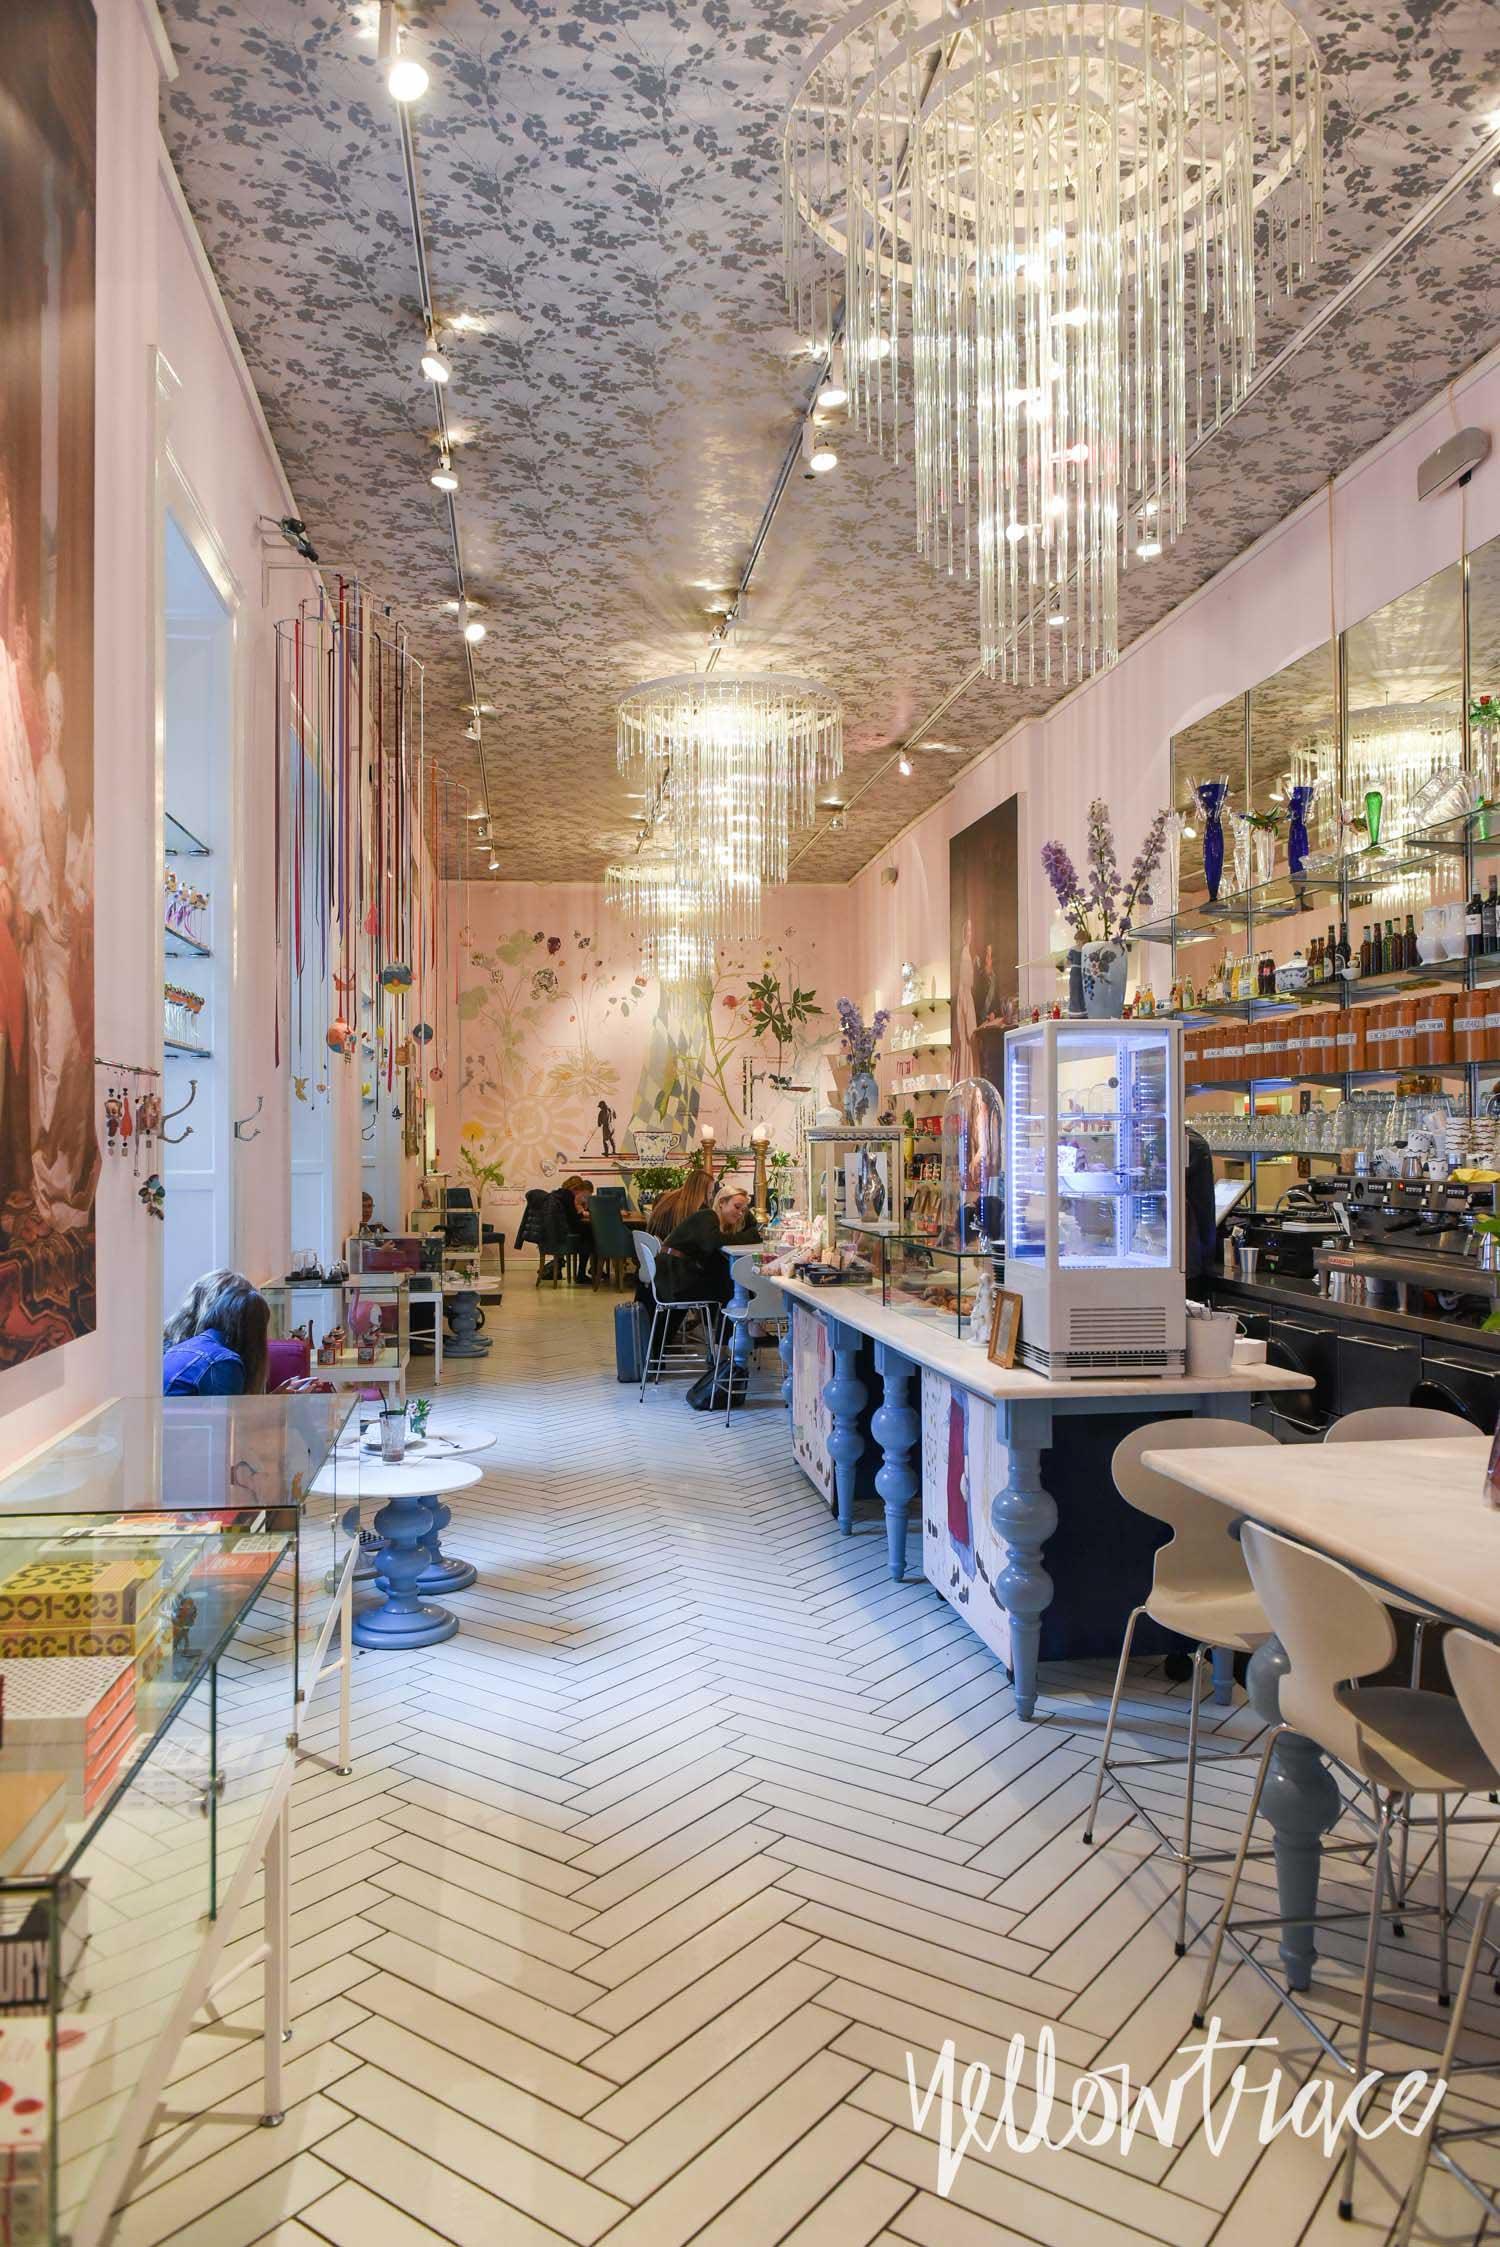 Royal Smushi Cafe Copenhagen, Photo  ©Nick Hughes | Yellowtrace